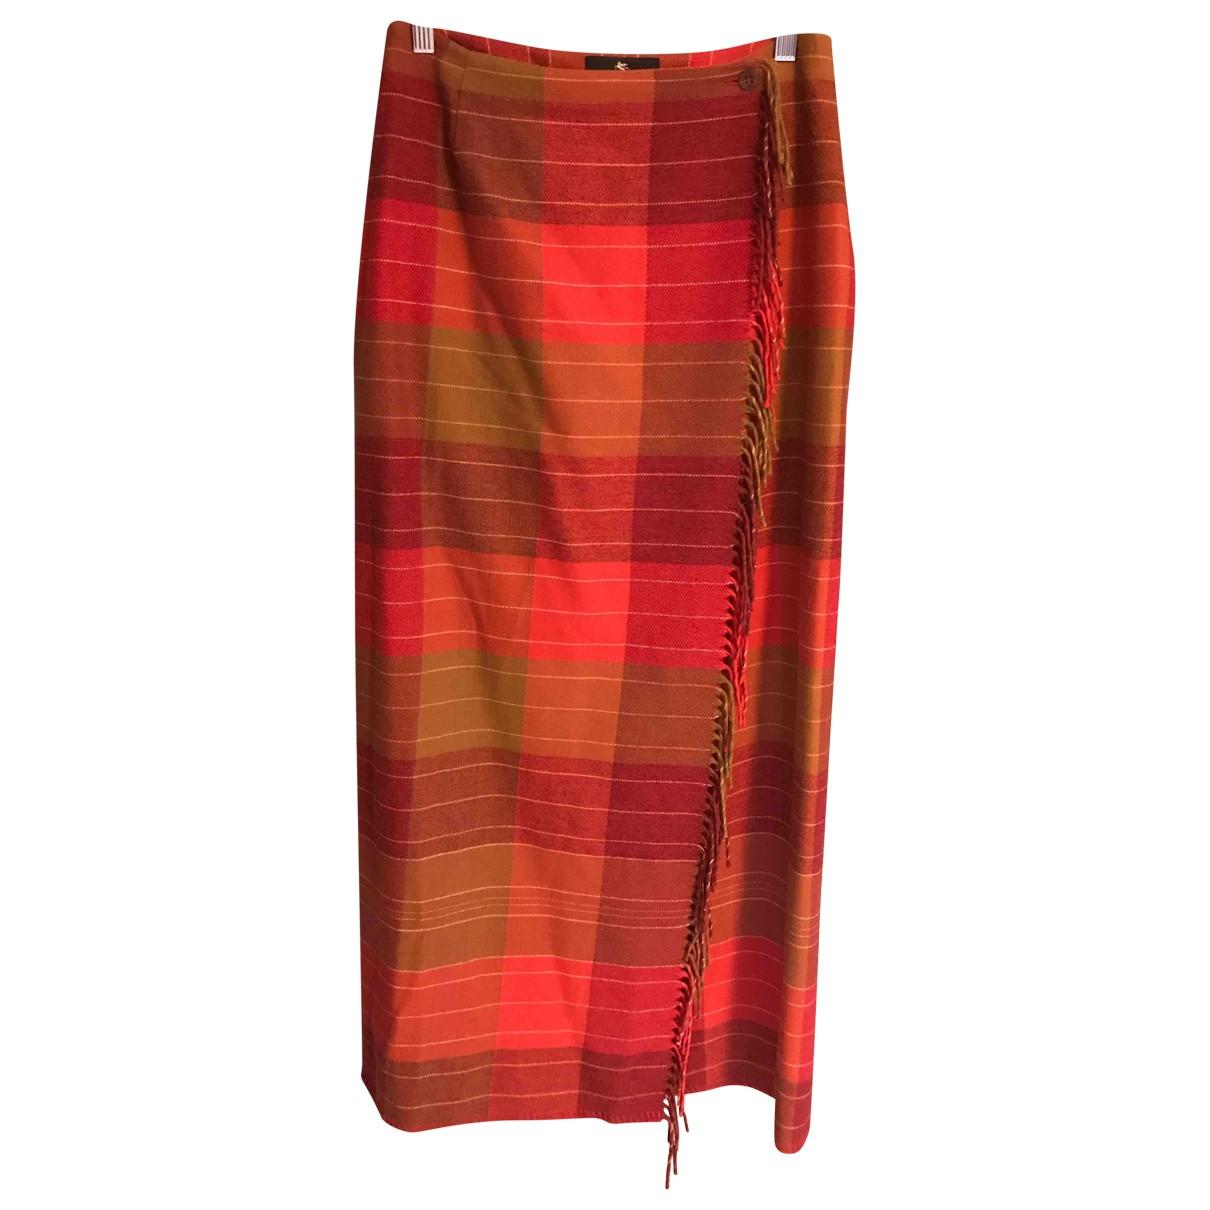 Etro \N Red Wool skirt for Women 42 IT